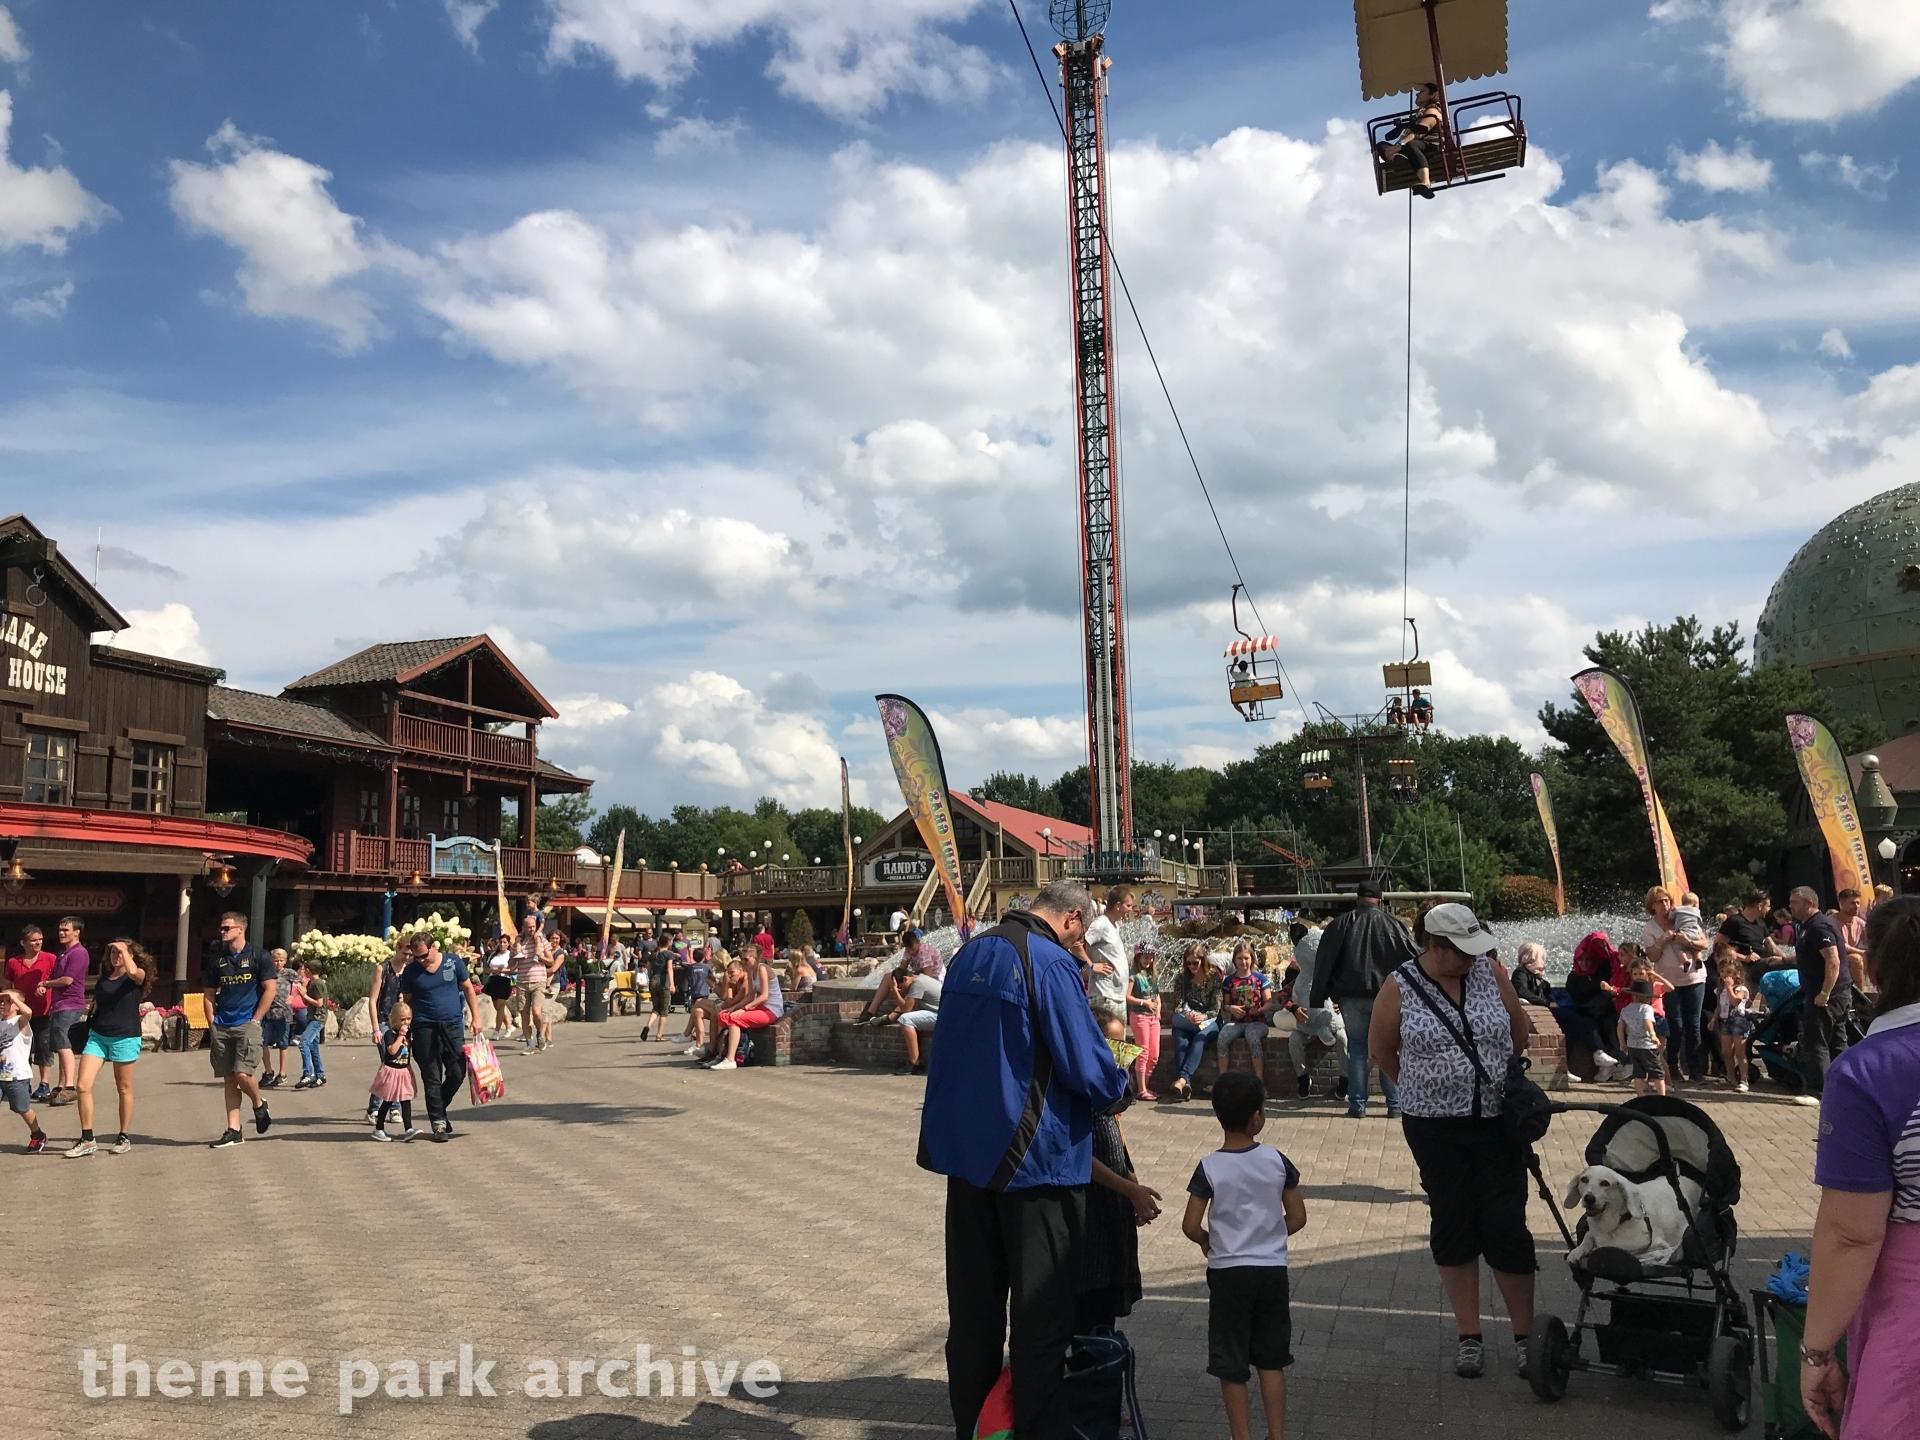 Cable Car at Attractiepark Slagharen